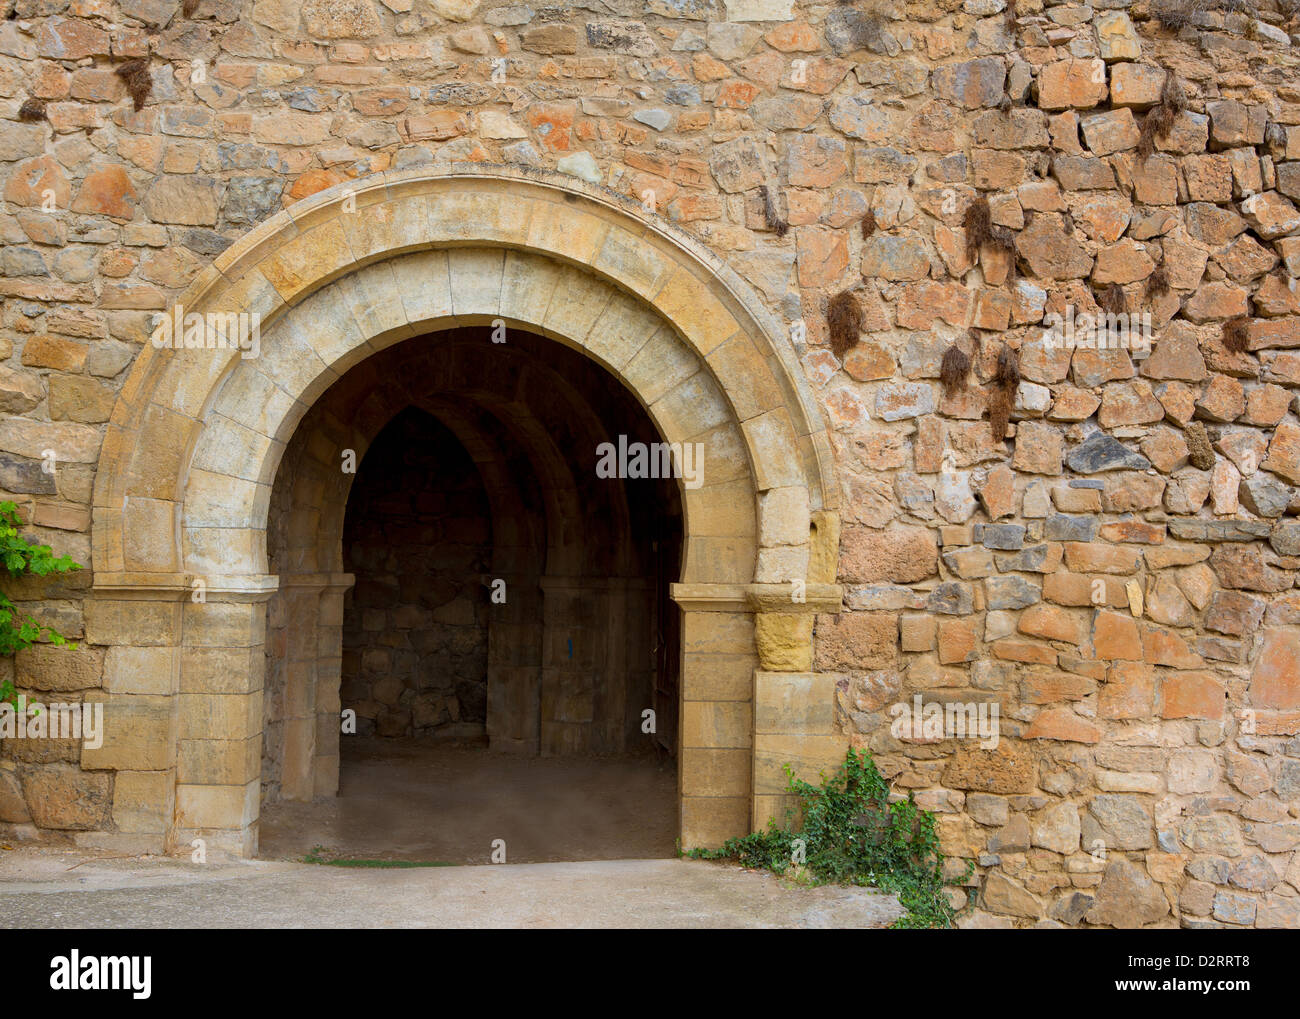 Canete cuenca puerta de san bartolome in stone masonry for Puerta 8 san marcos